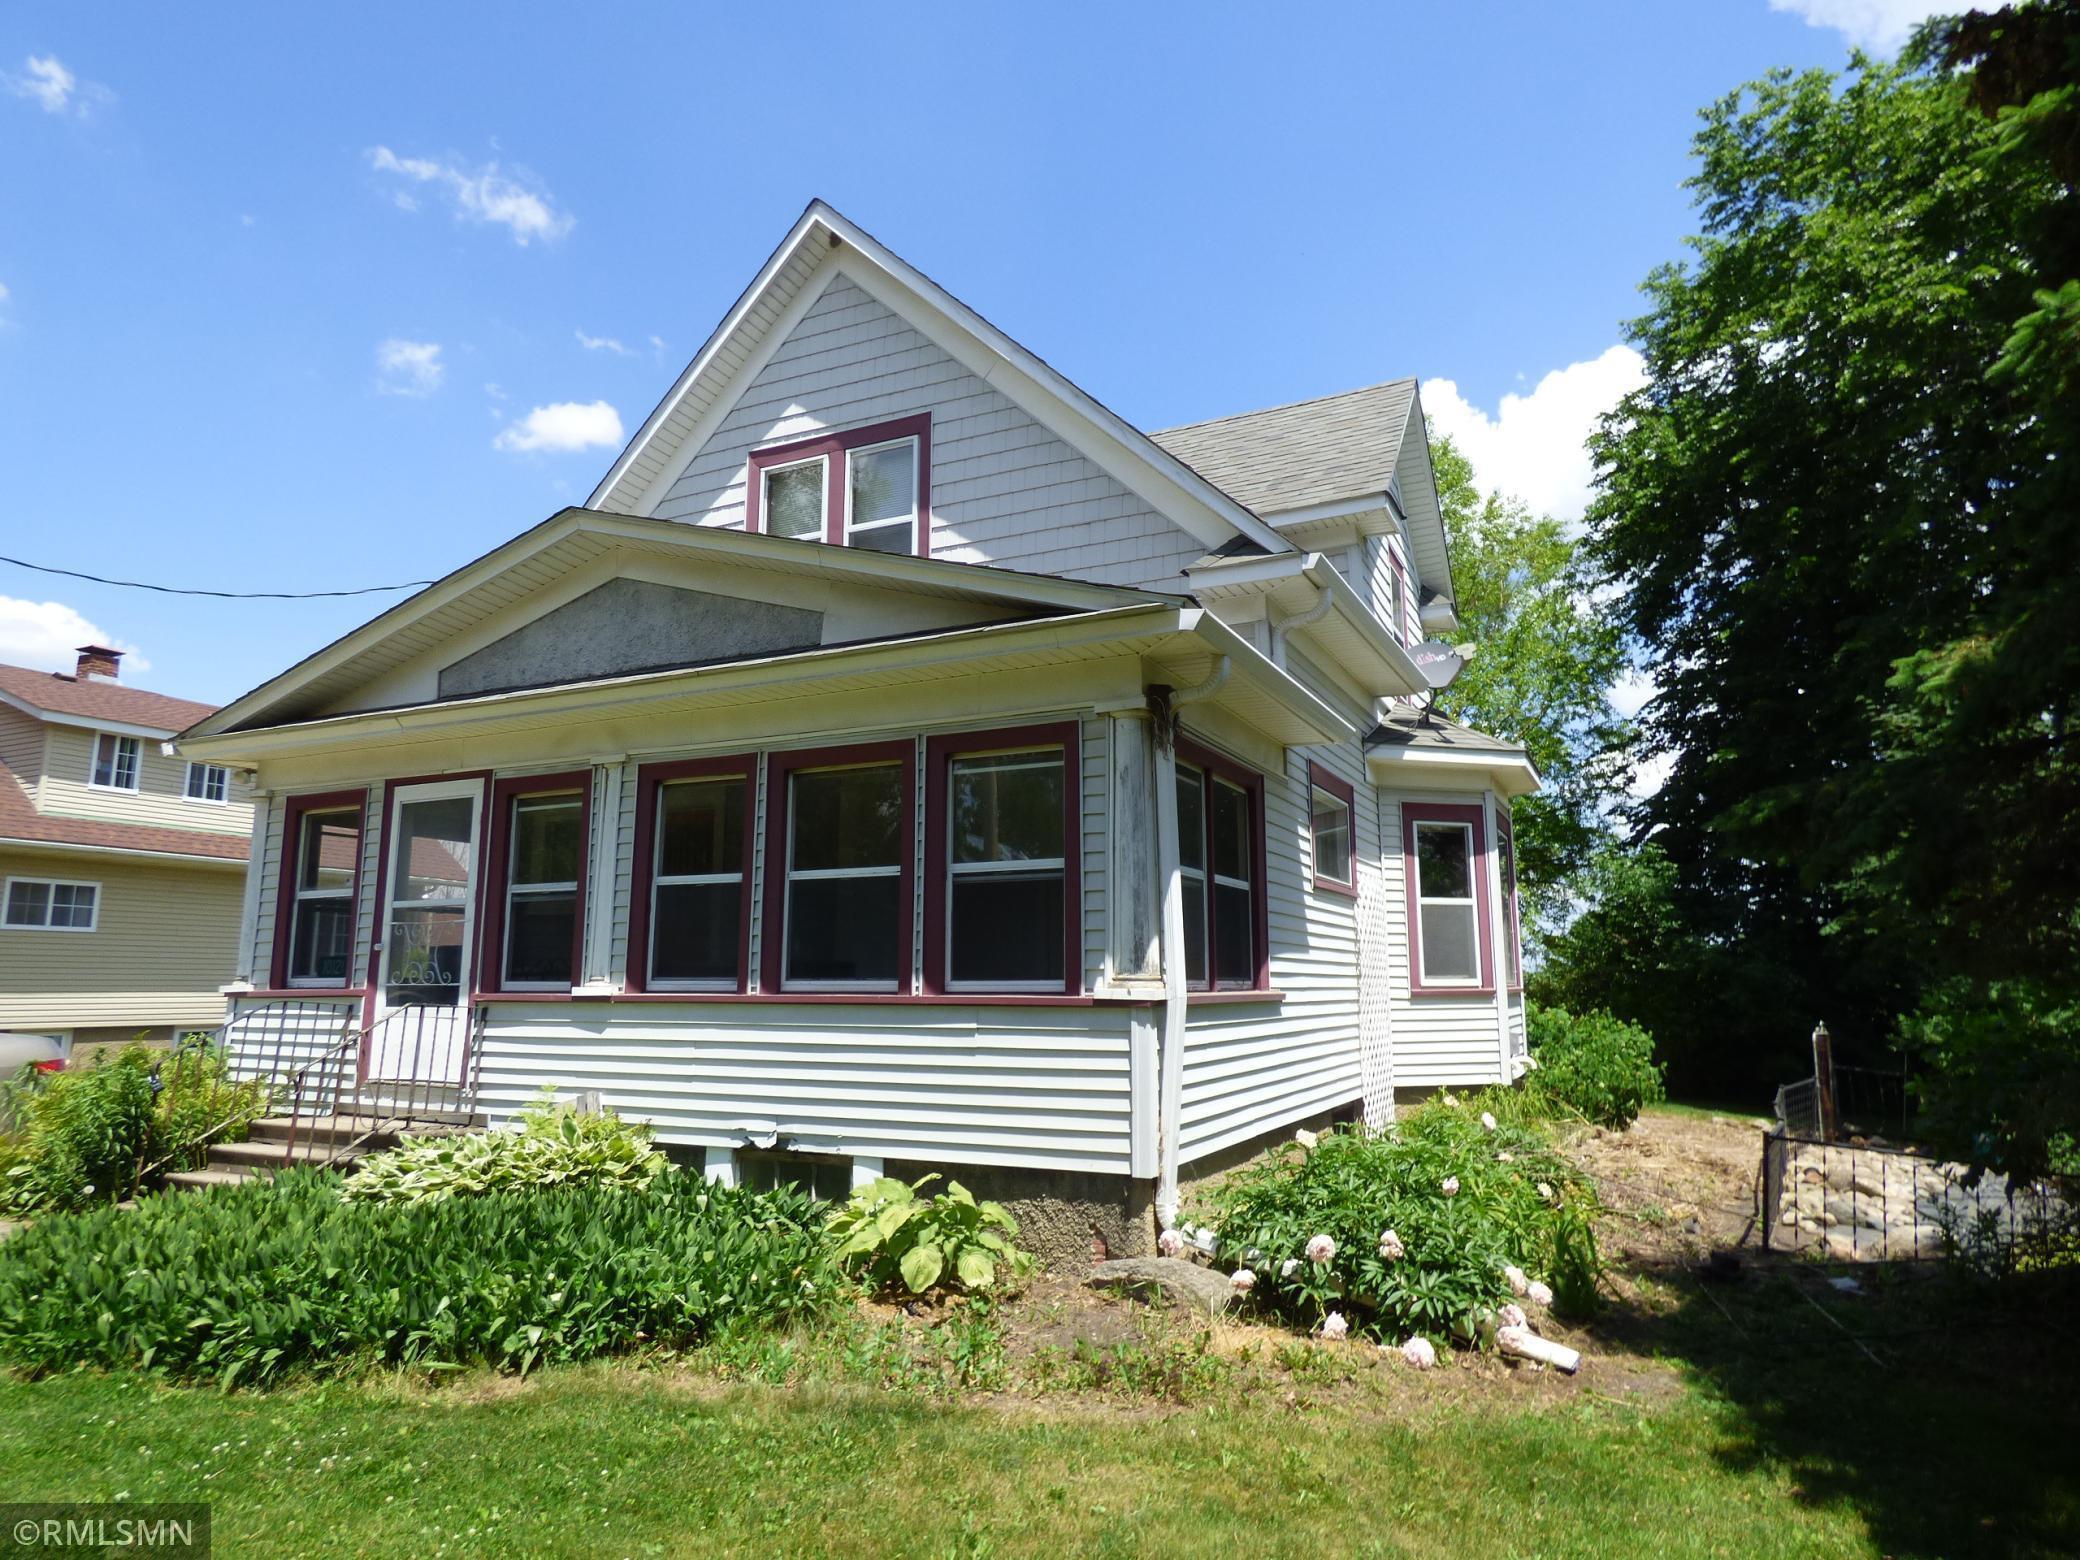 10121 Bixby Place, Blooming Prairie, MN 55917